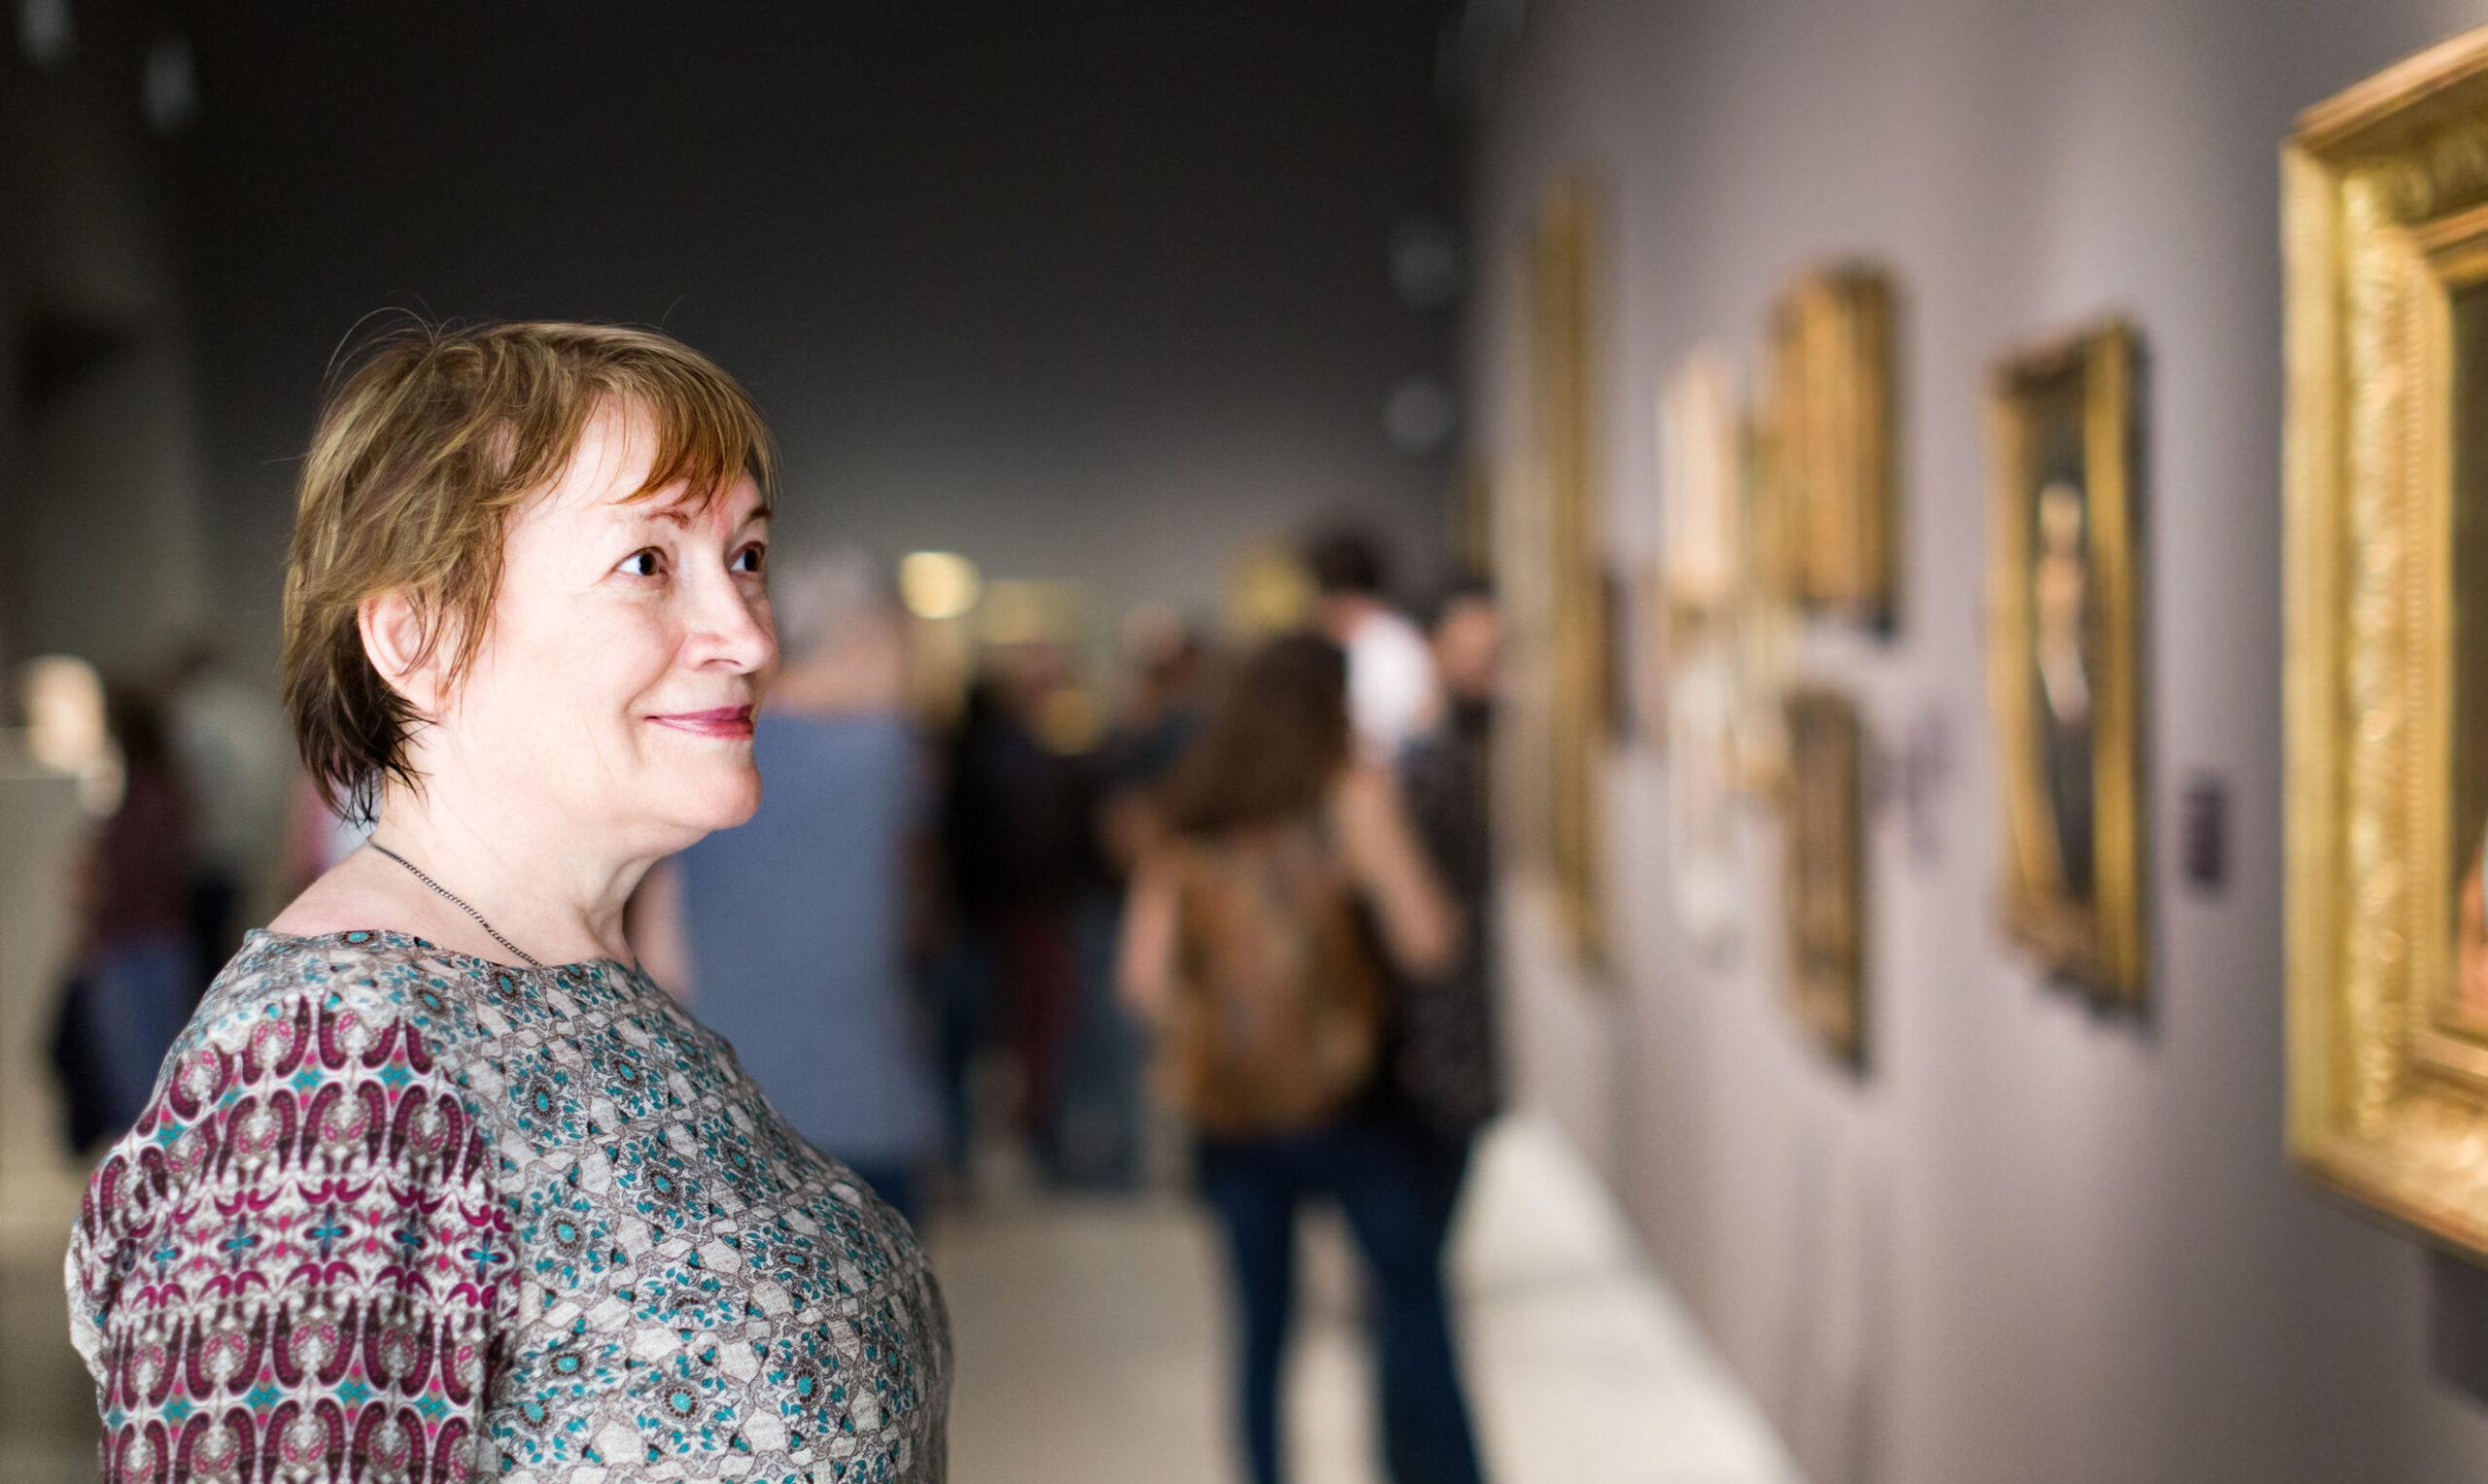 senior woman looking at hanging artwork